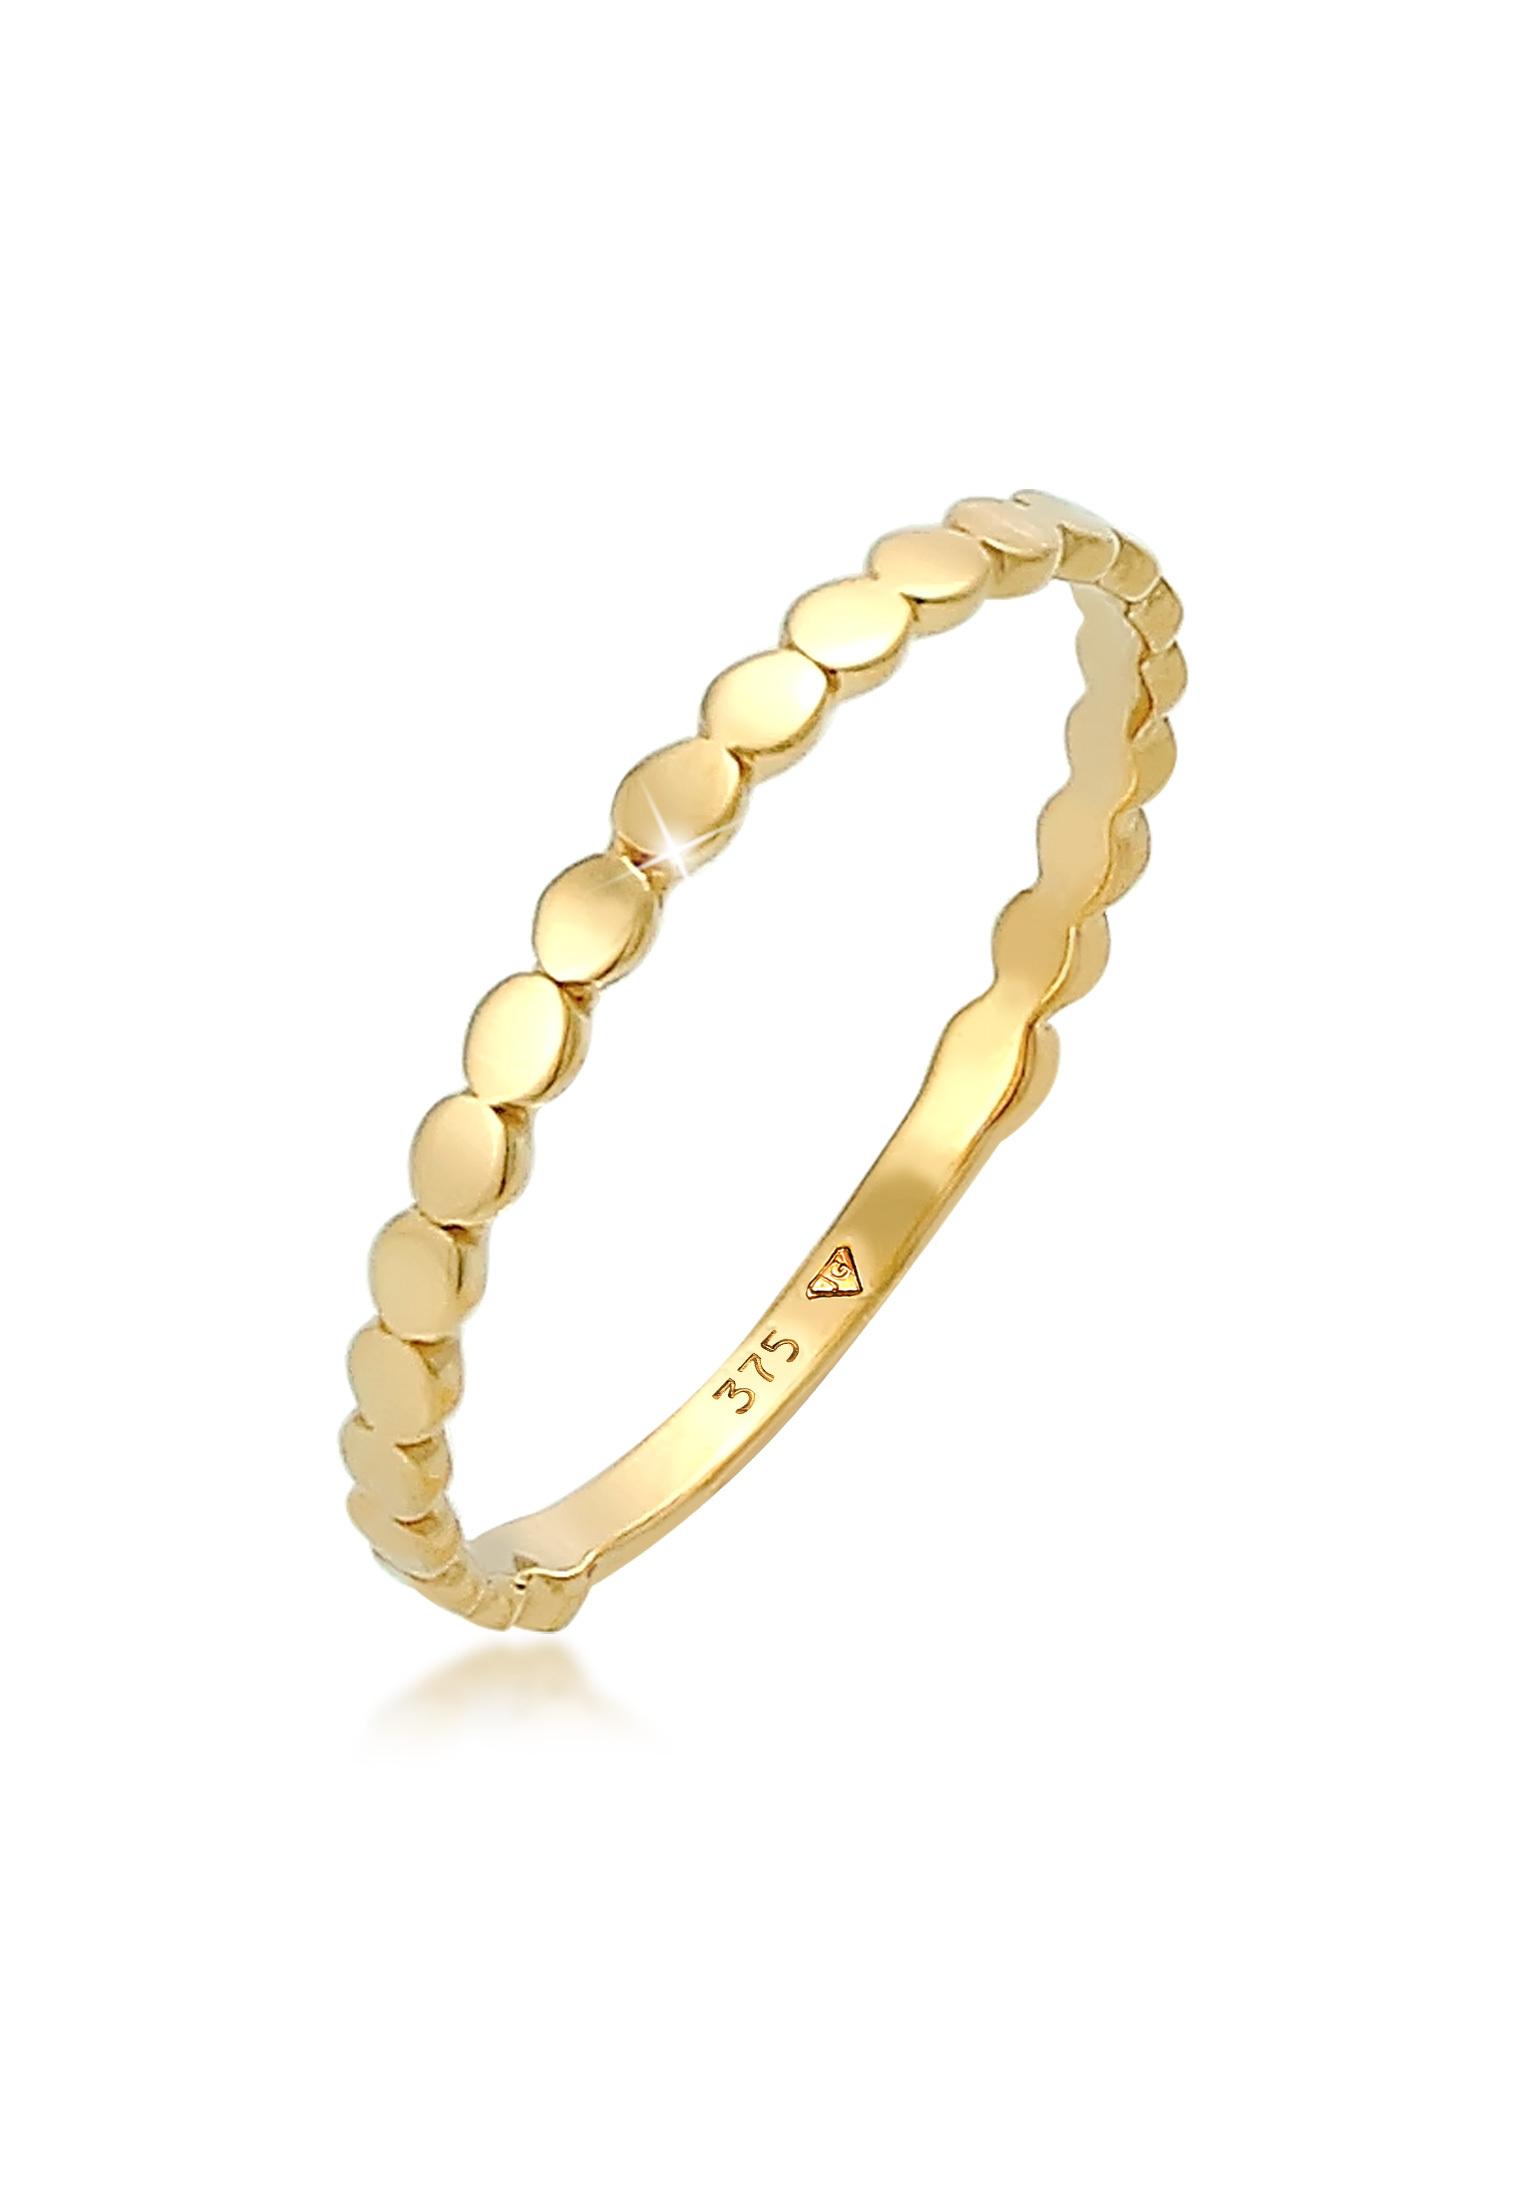 Ring Kreis   375 Gelbgold